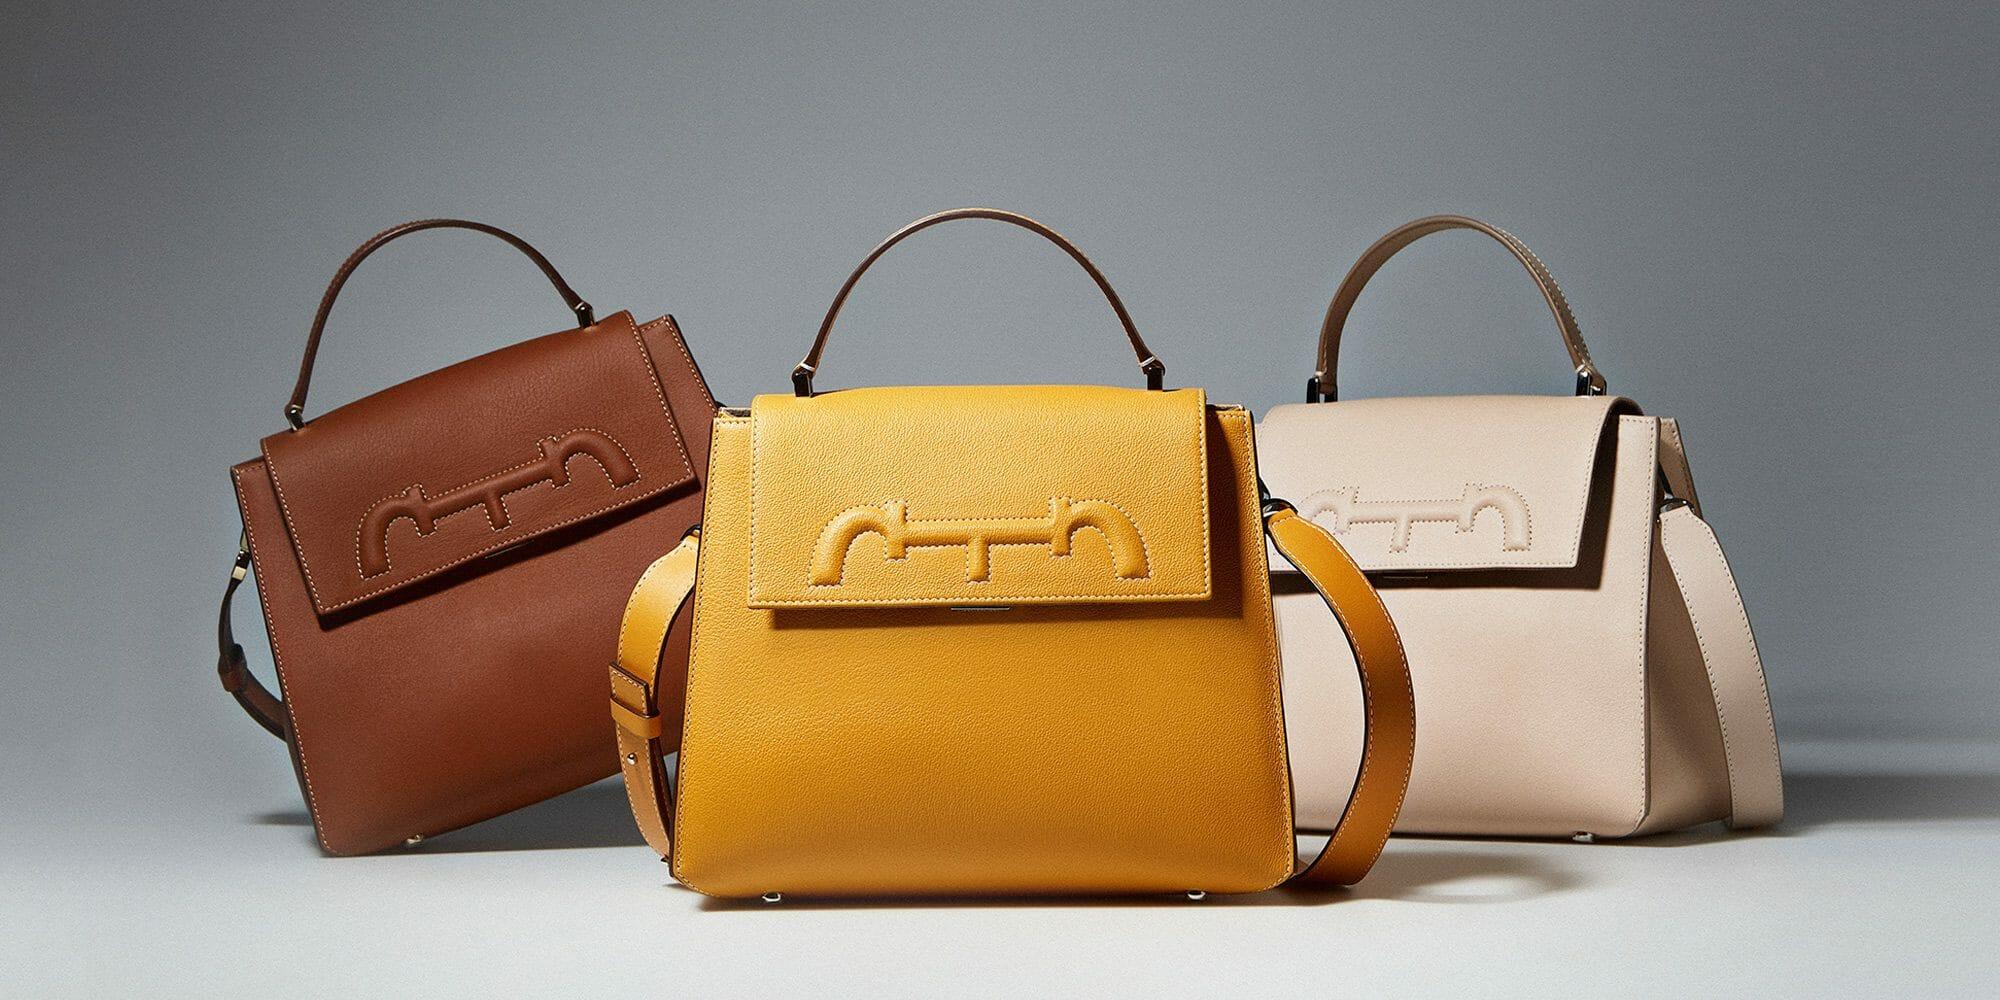 64fe989f1 Carolina Herrera Official Site | Avant-Elegant Fashion & Fragrances